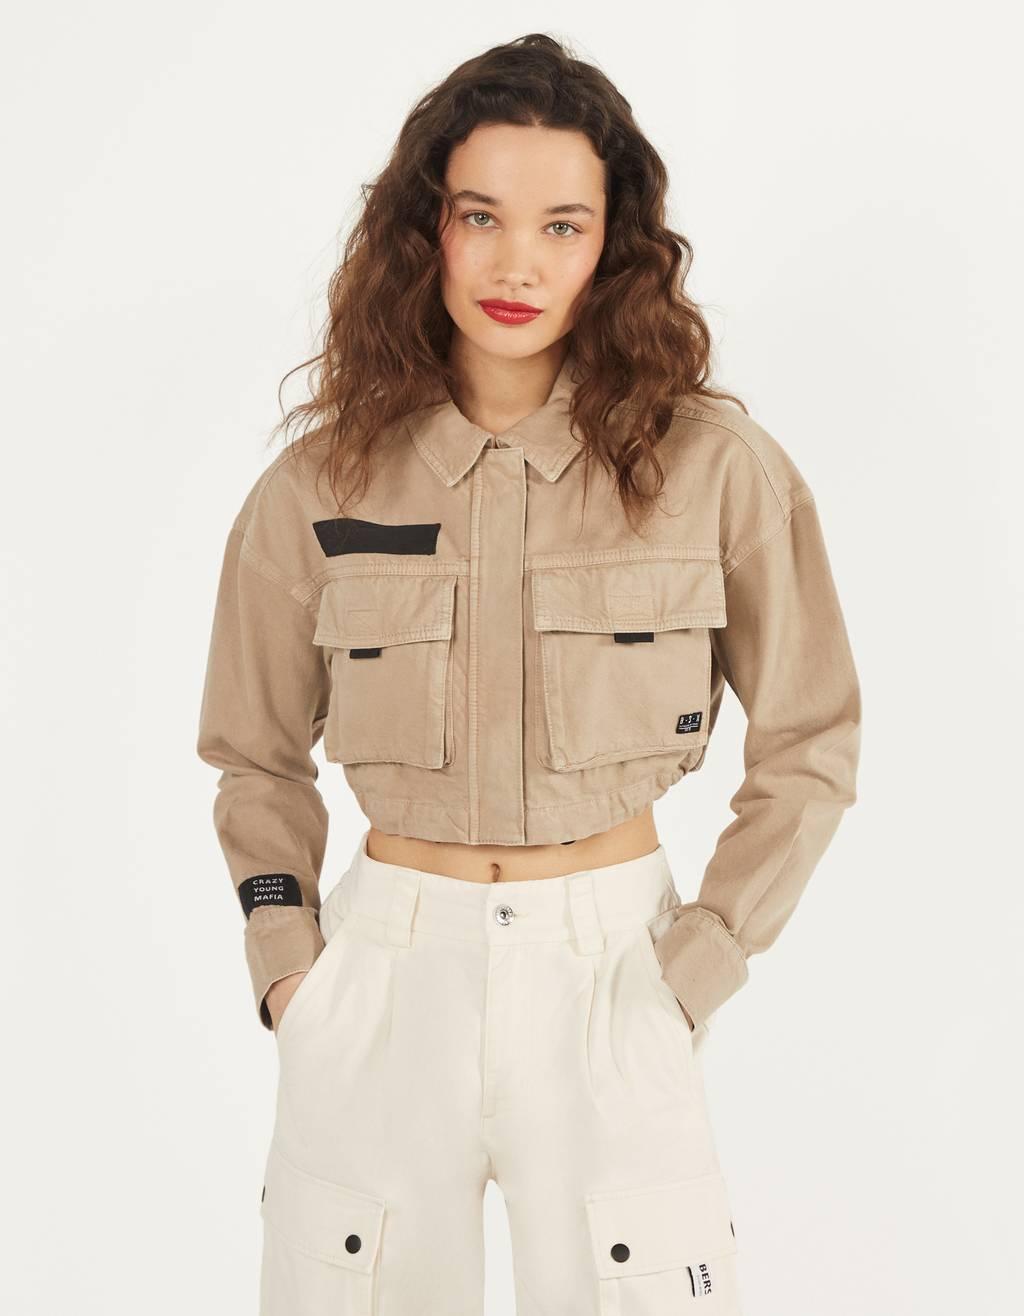 Базовая укороченная куртка